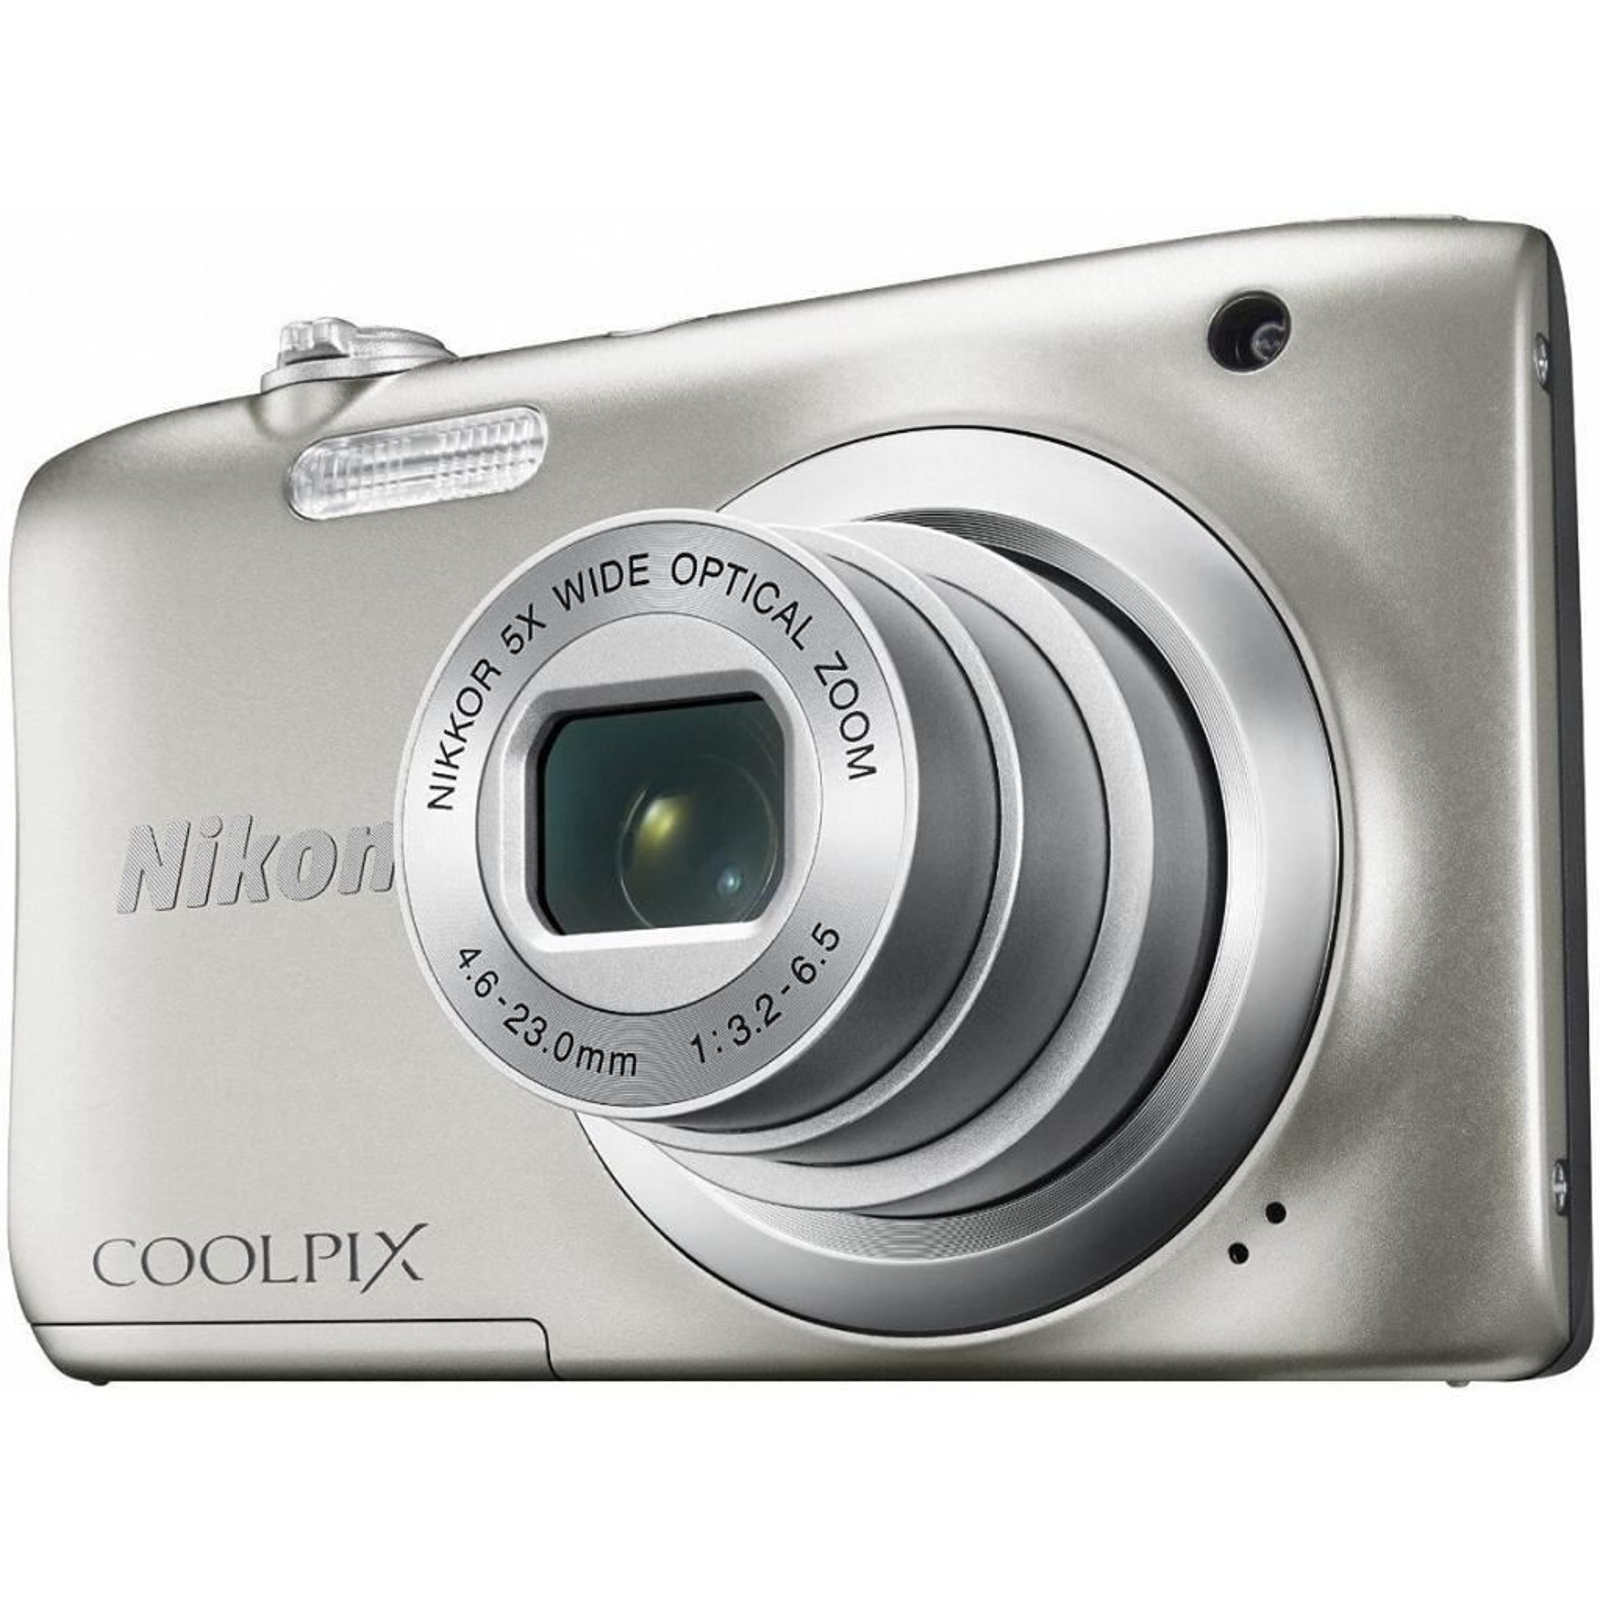 Цифровой фотоаппарат Nikon Coolpix A100 Silver (VNA970E1) изображение 6